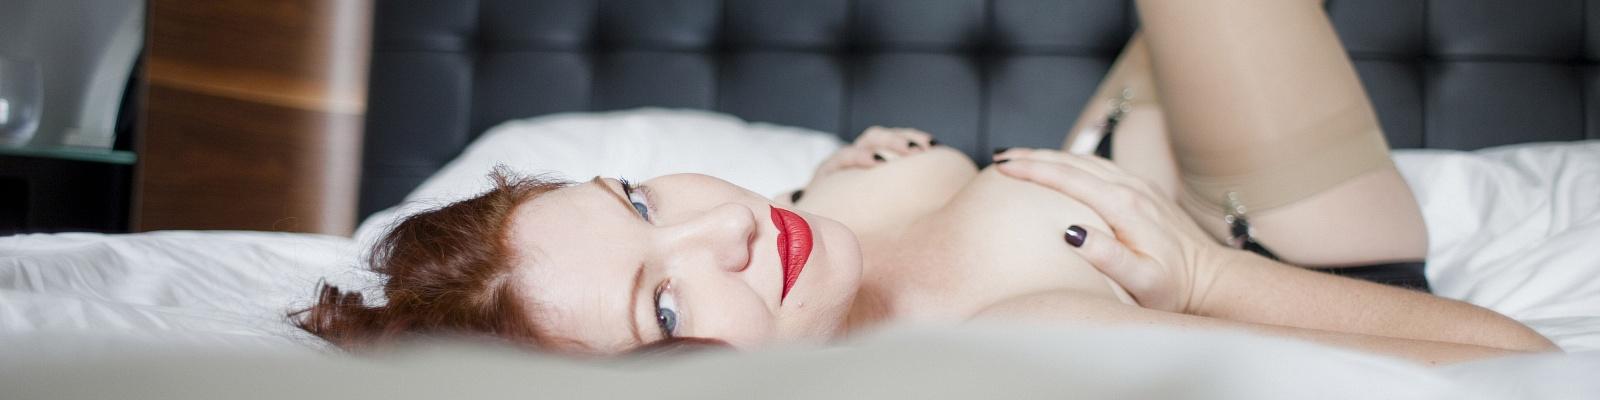 Kimberlee Cline's Cover Photo